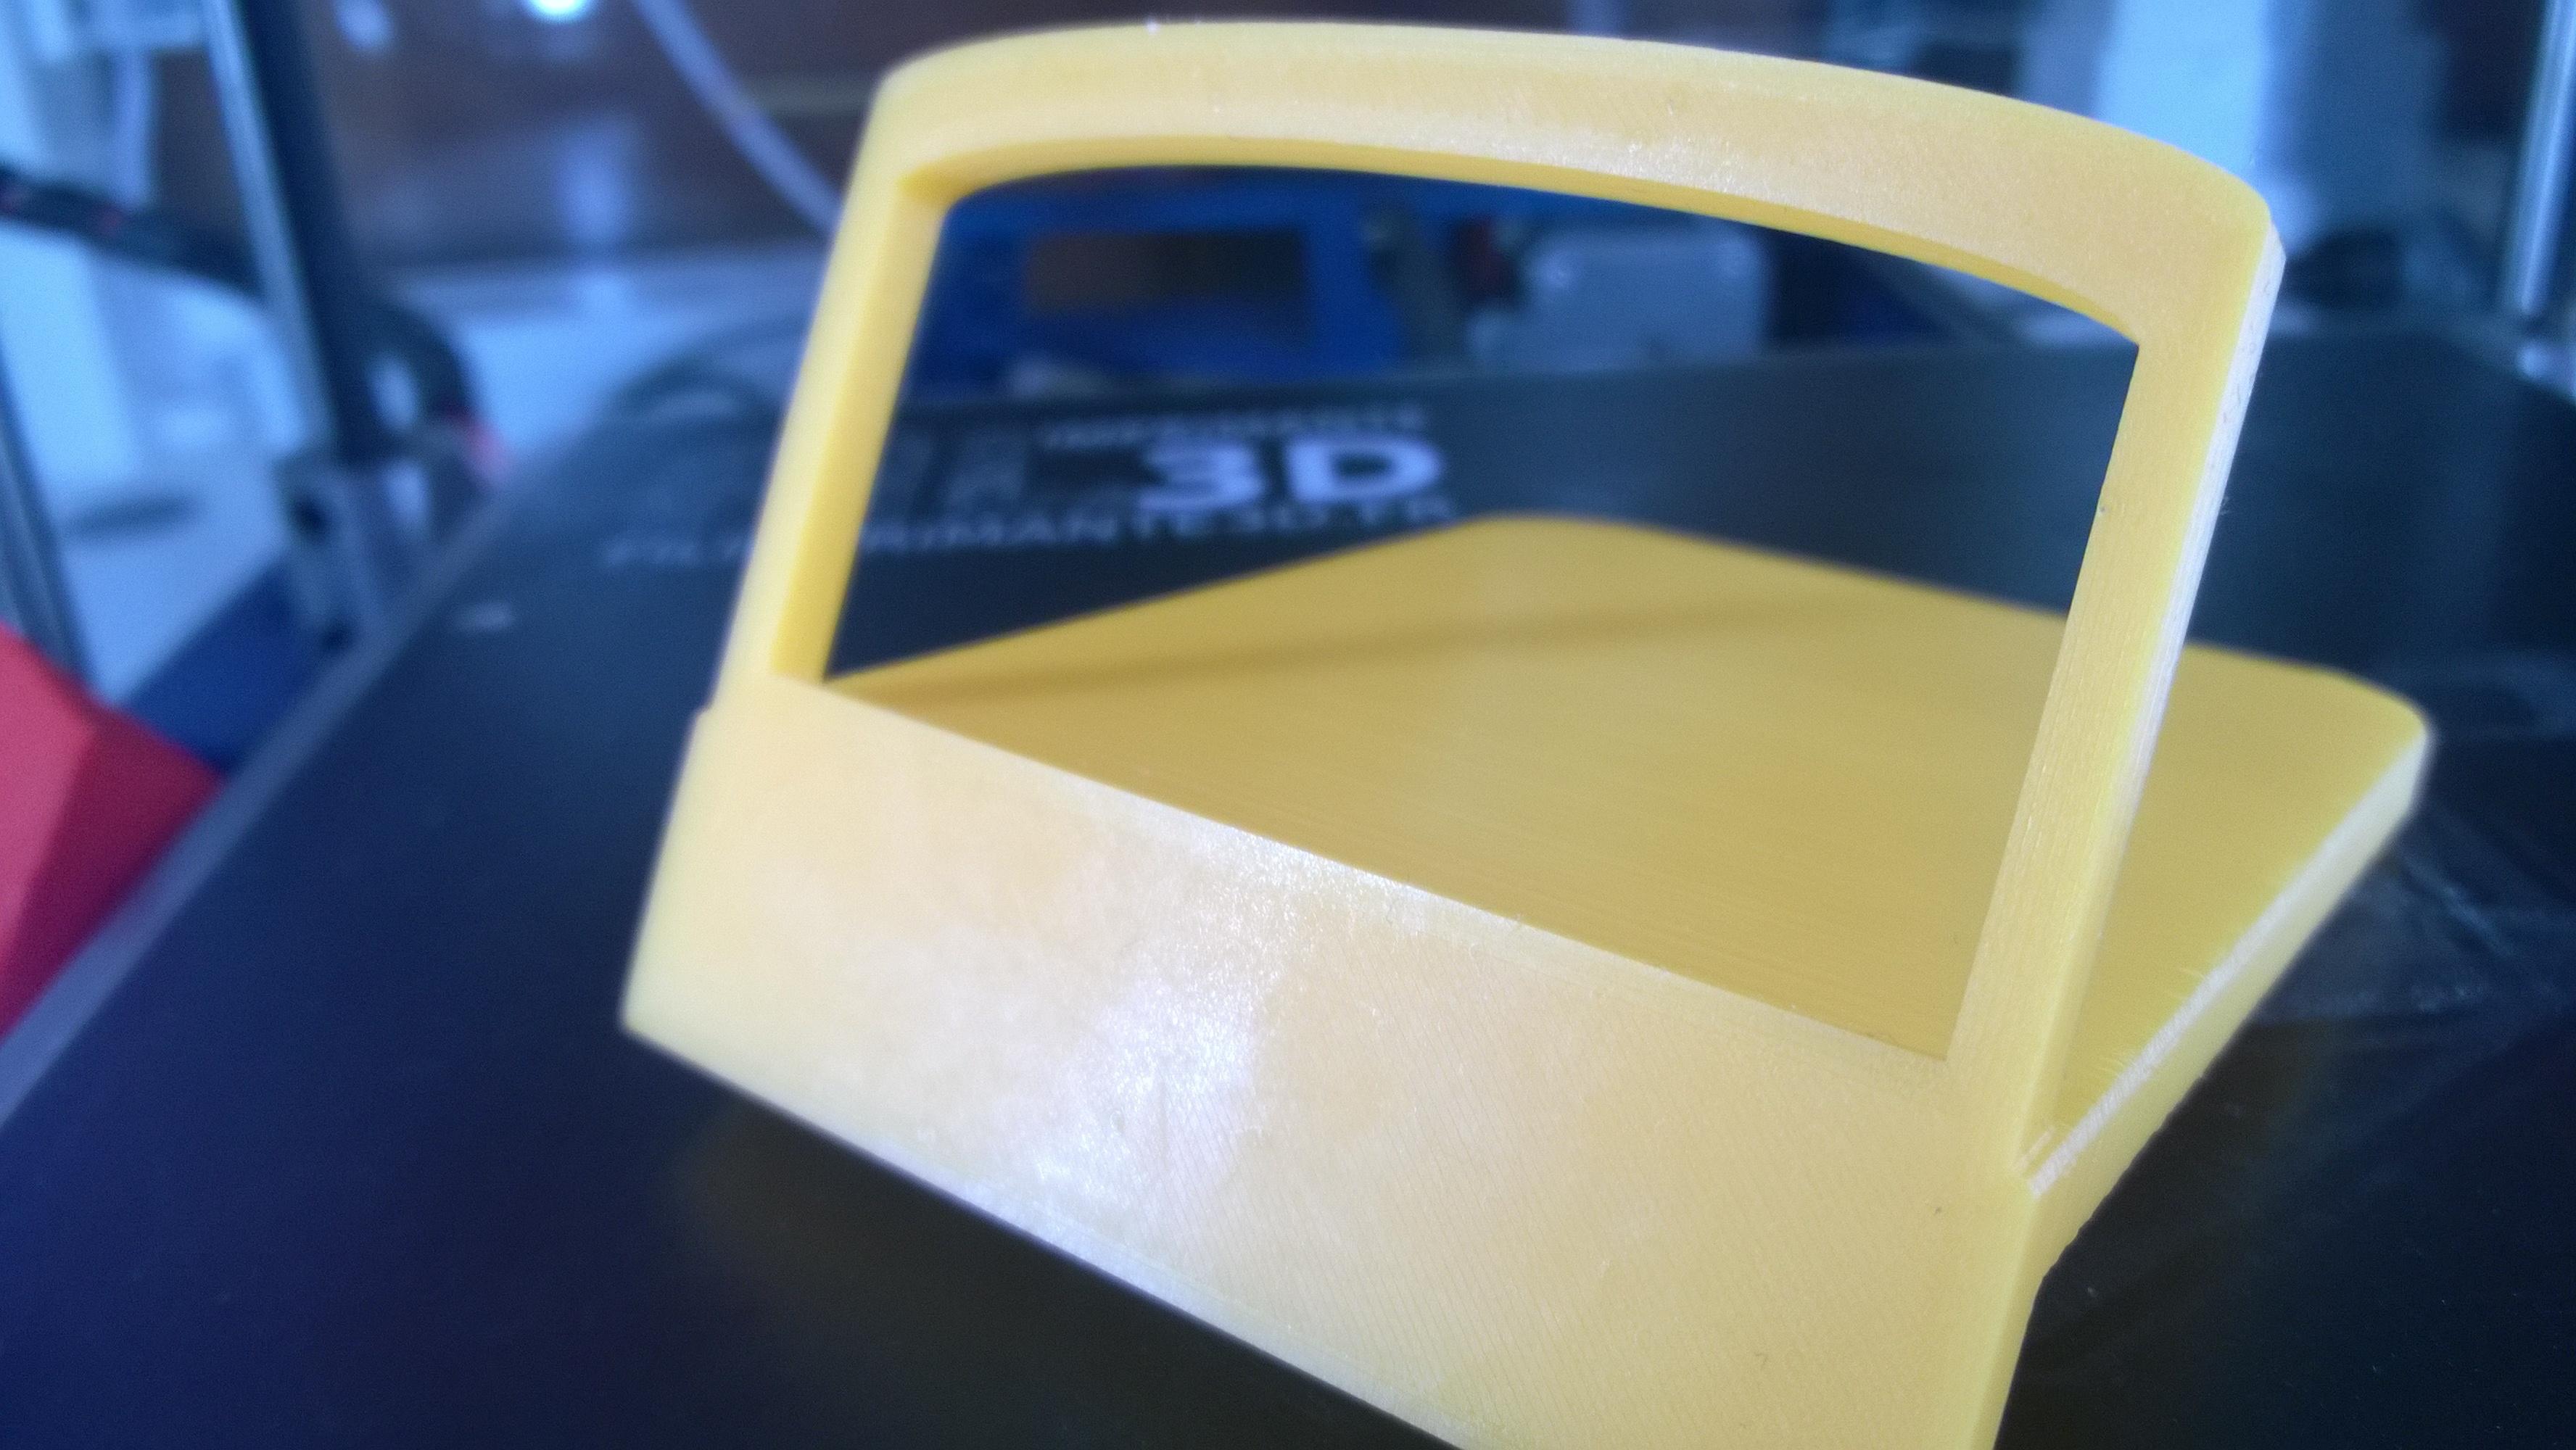 WP_20171115_00_47_32_Pro.jpg Download free STL file support de téléphone • 3D printing template, Cyborg